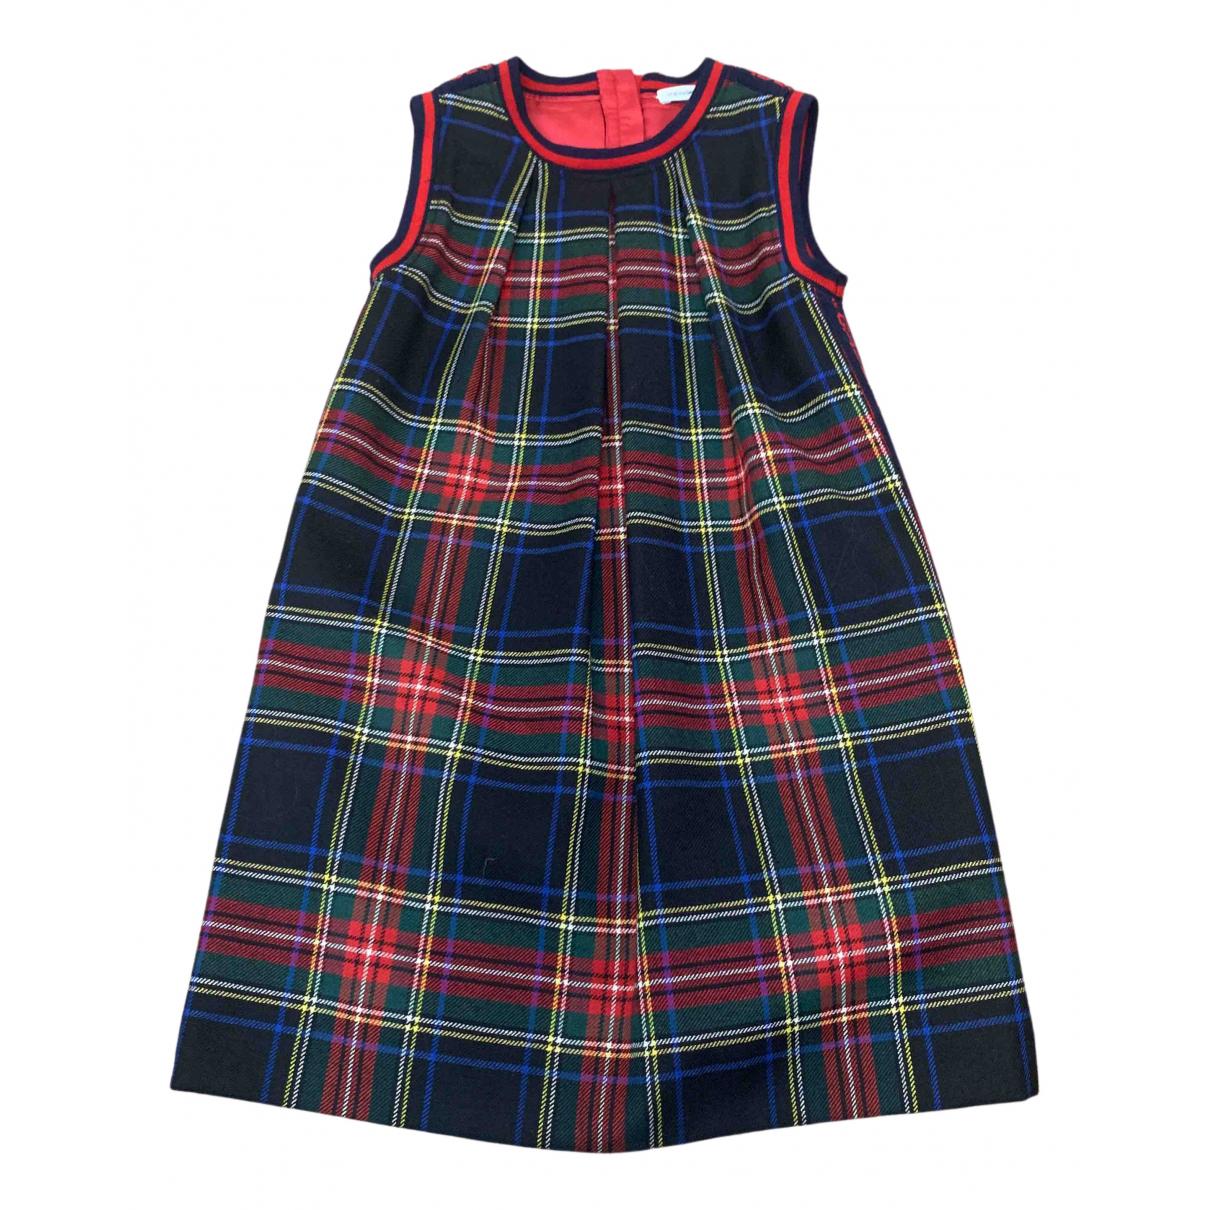 Dolce & Gabbana \N Kleid in Polyester